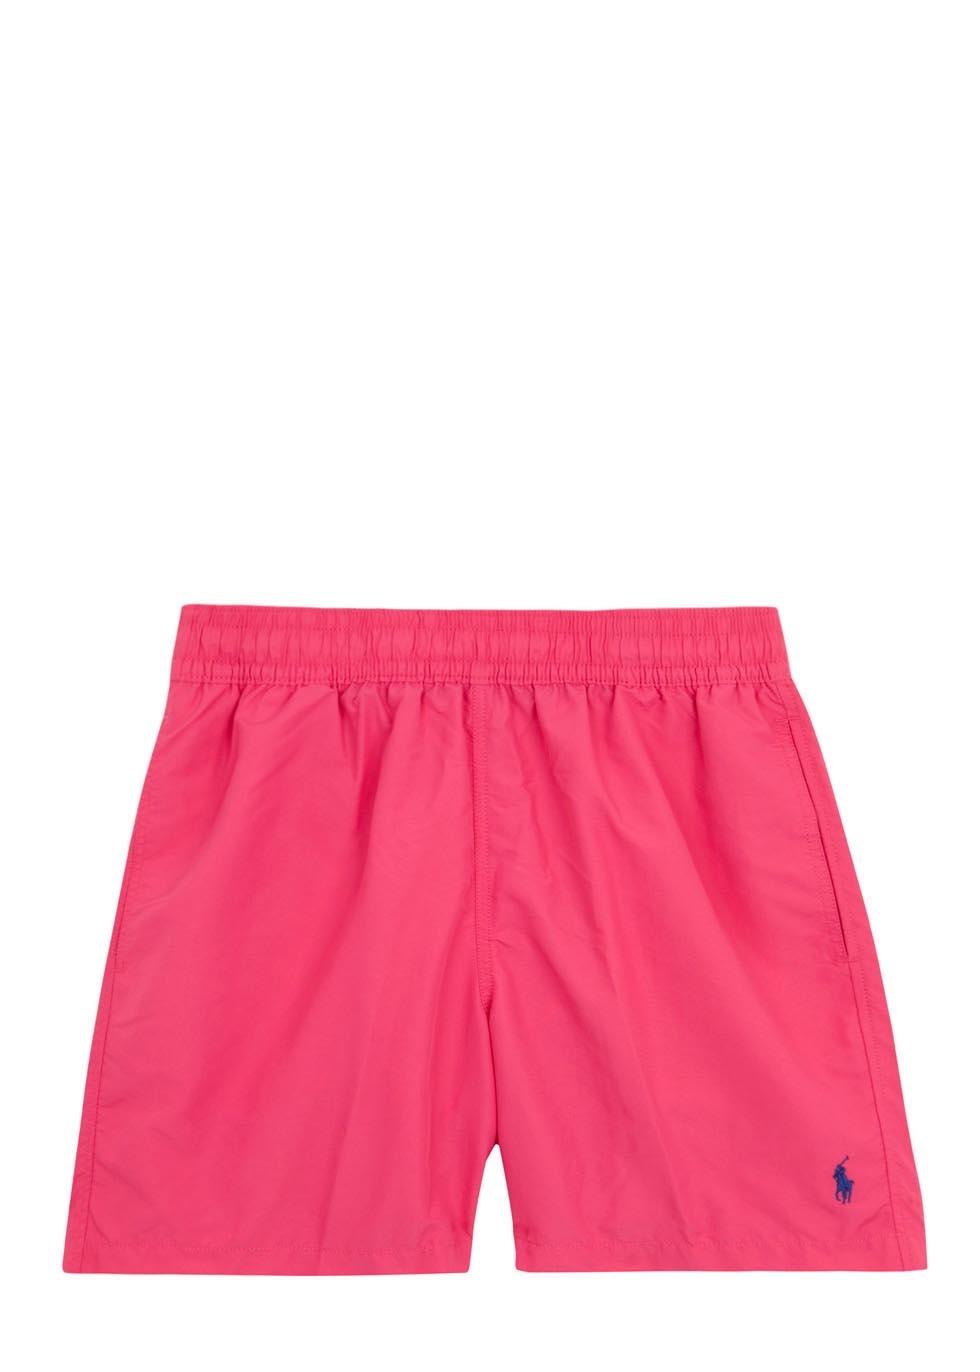 5c3077acd5 ... canada polo ralph lauren hawaiian pink swim shorts in pink for men lyst  9fbd5 1679b